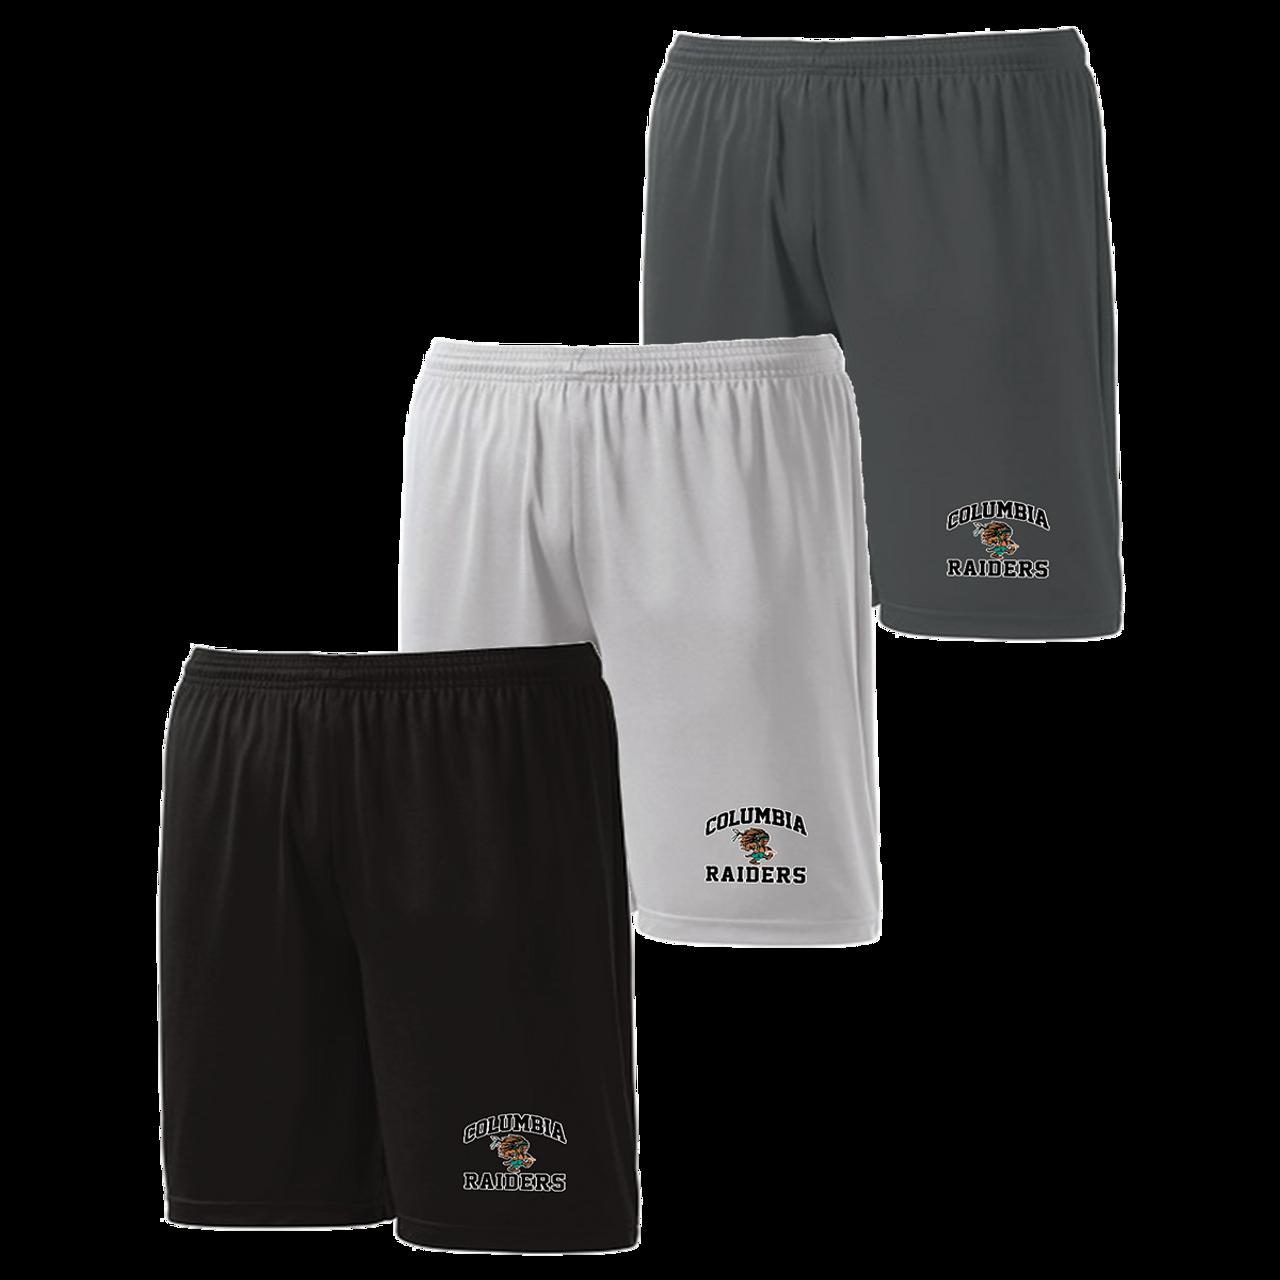 7f2b83b03515d Columbia Raiders Shorts (S145) - RycoSports